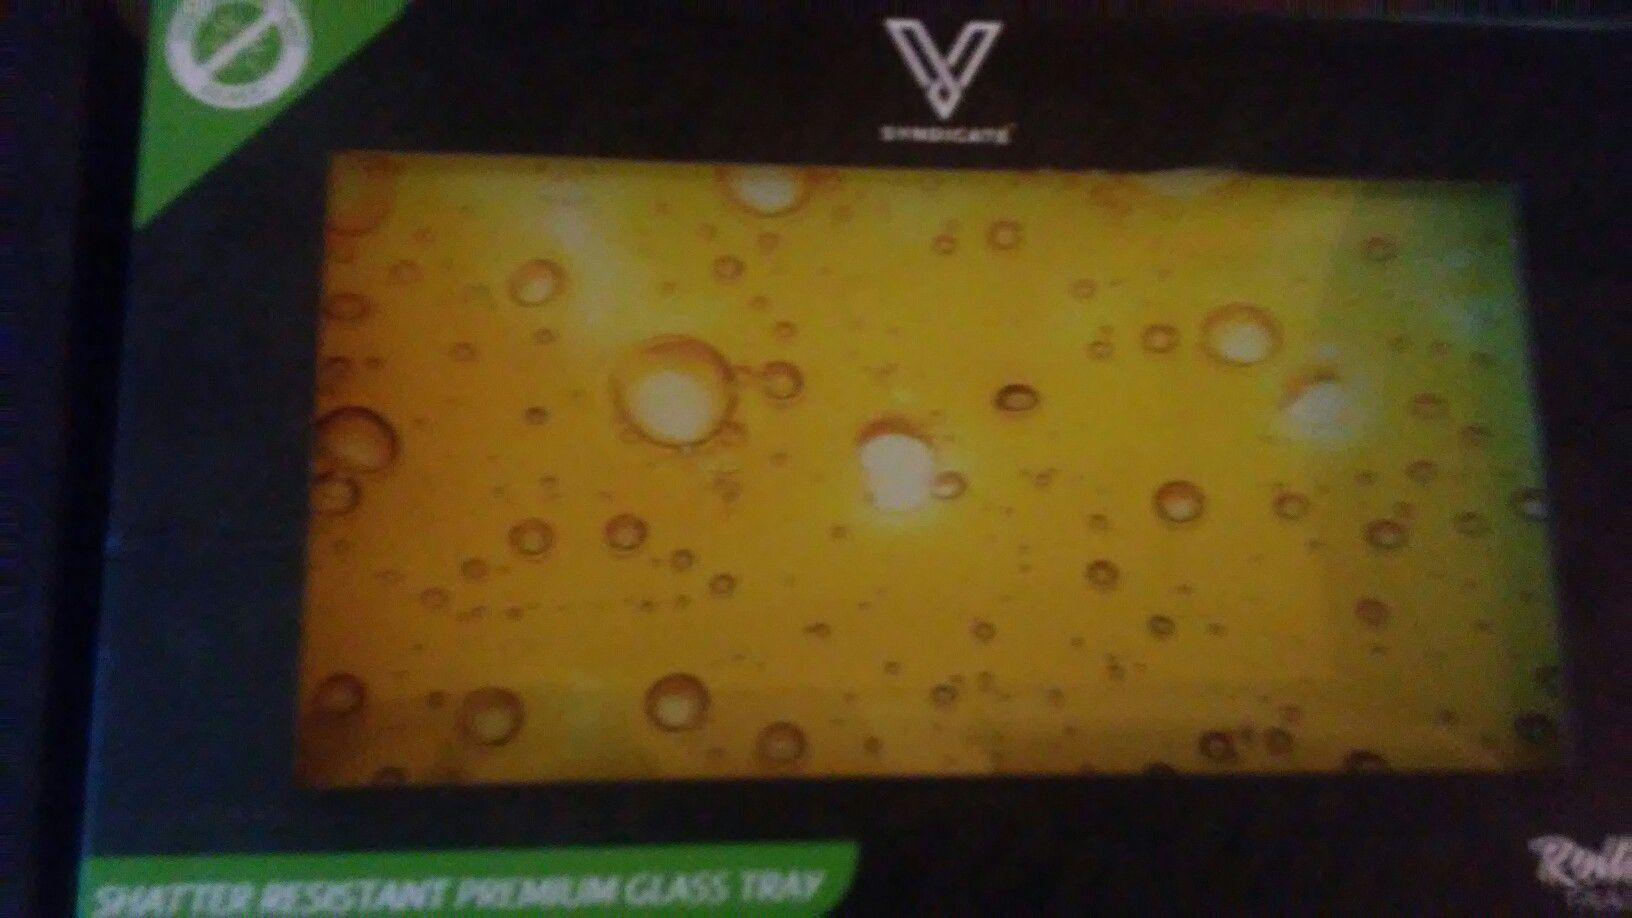 Shatter Resistant Premium Glass Trays